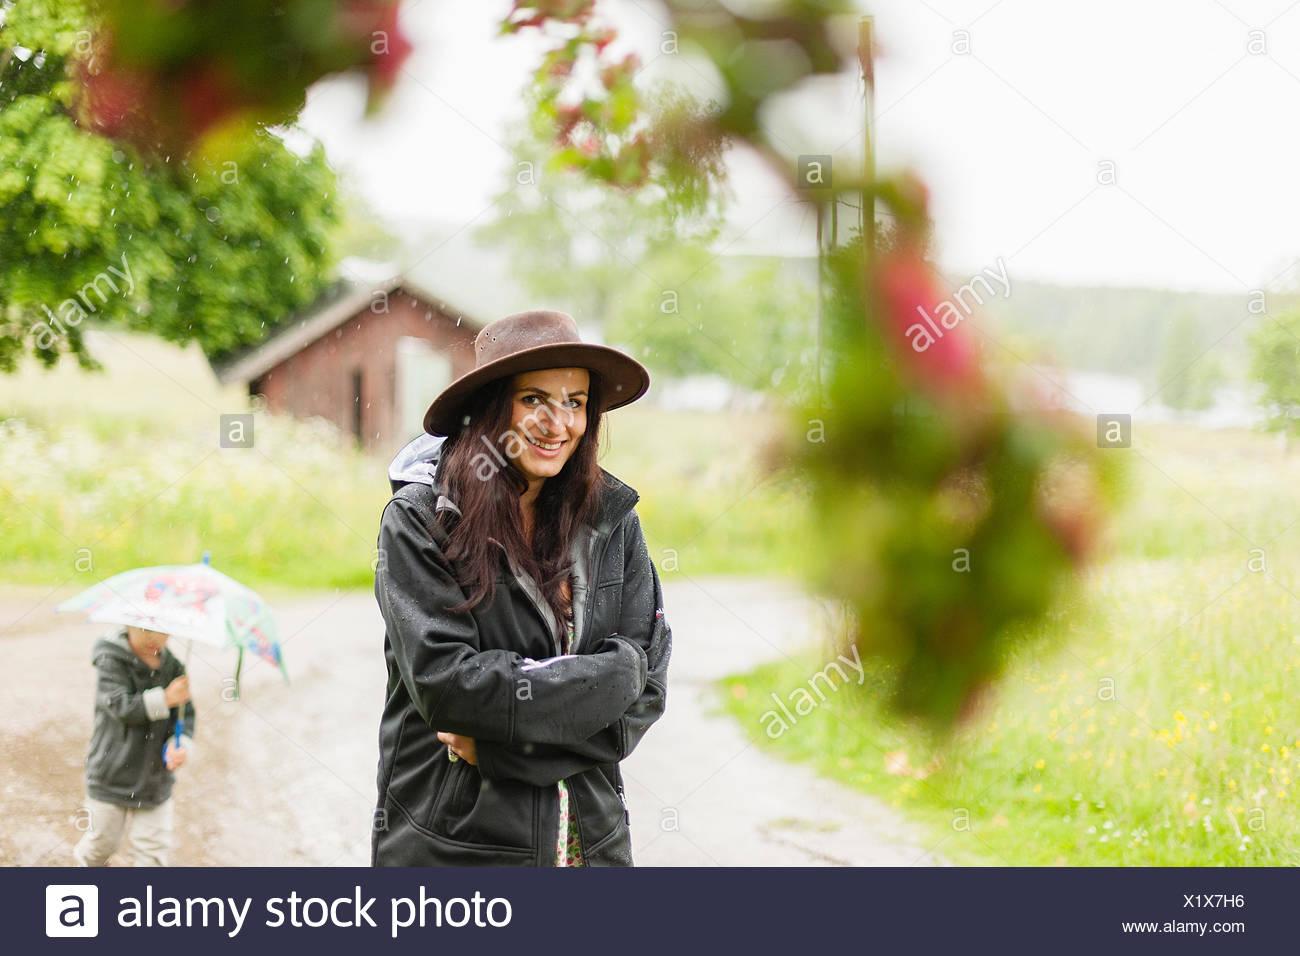 Suecia, Varmland, Filipstad, Gasborn, Horrsjon, Retrato de mujer de pie en la lluvia Imagen De Stock